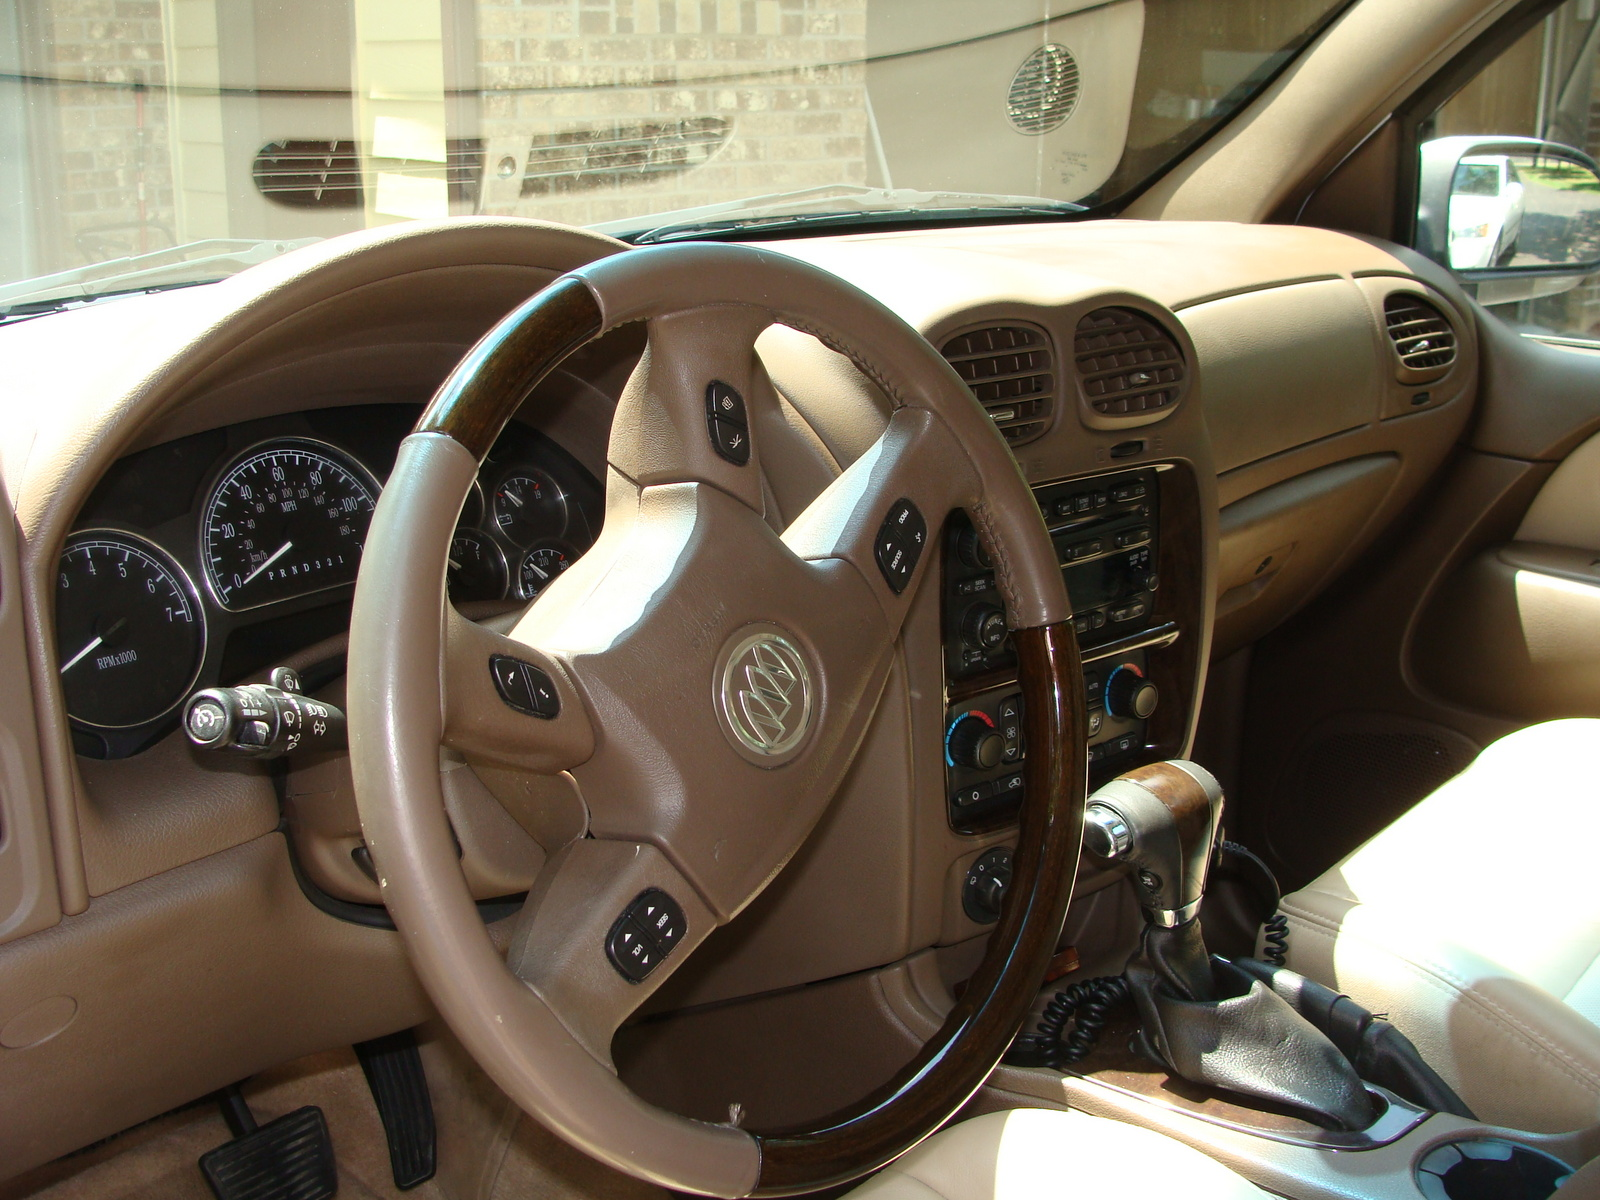 2004 Buick Rainier Cxl Interior Fuse Box On Information And Photos Zombiedrive 1600x1200